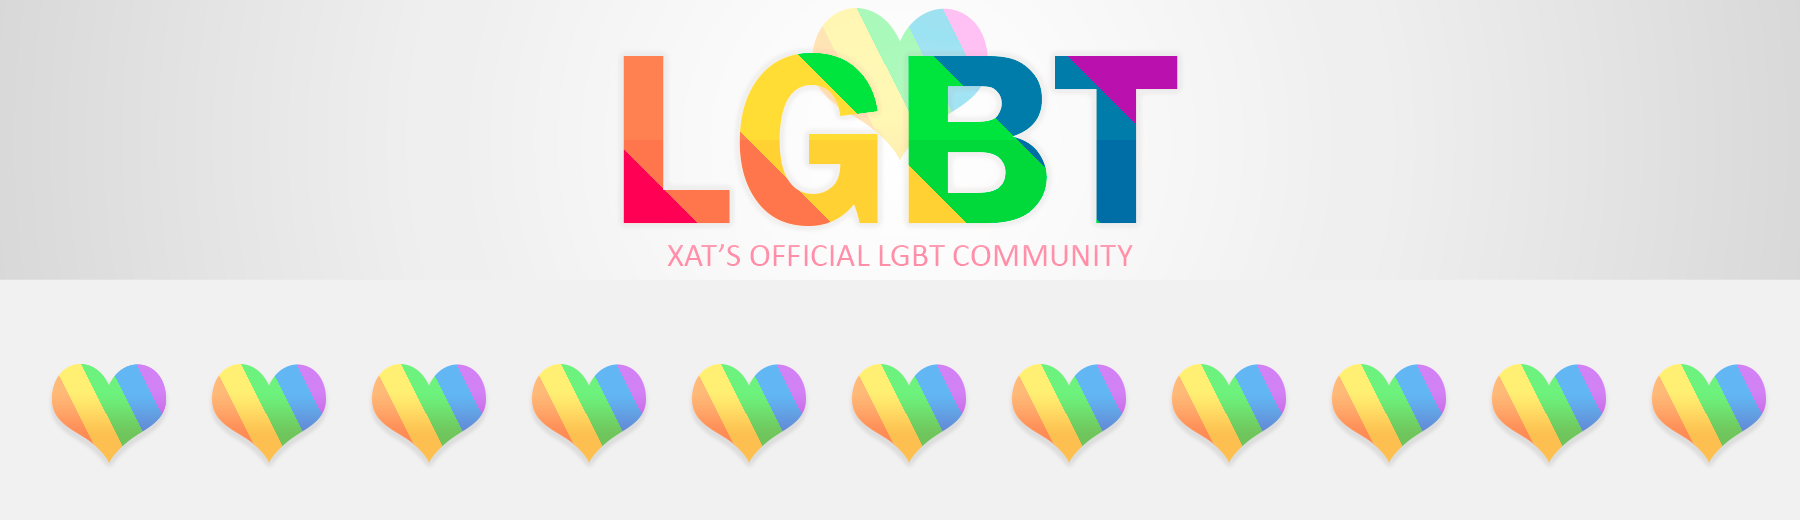 xat's Official LGBT Community